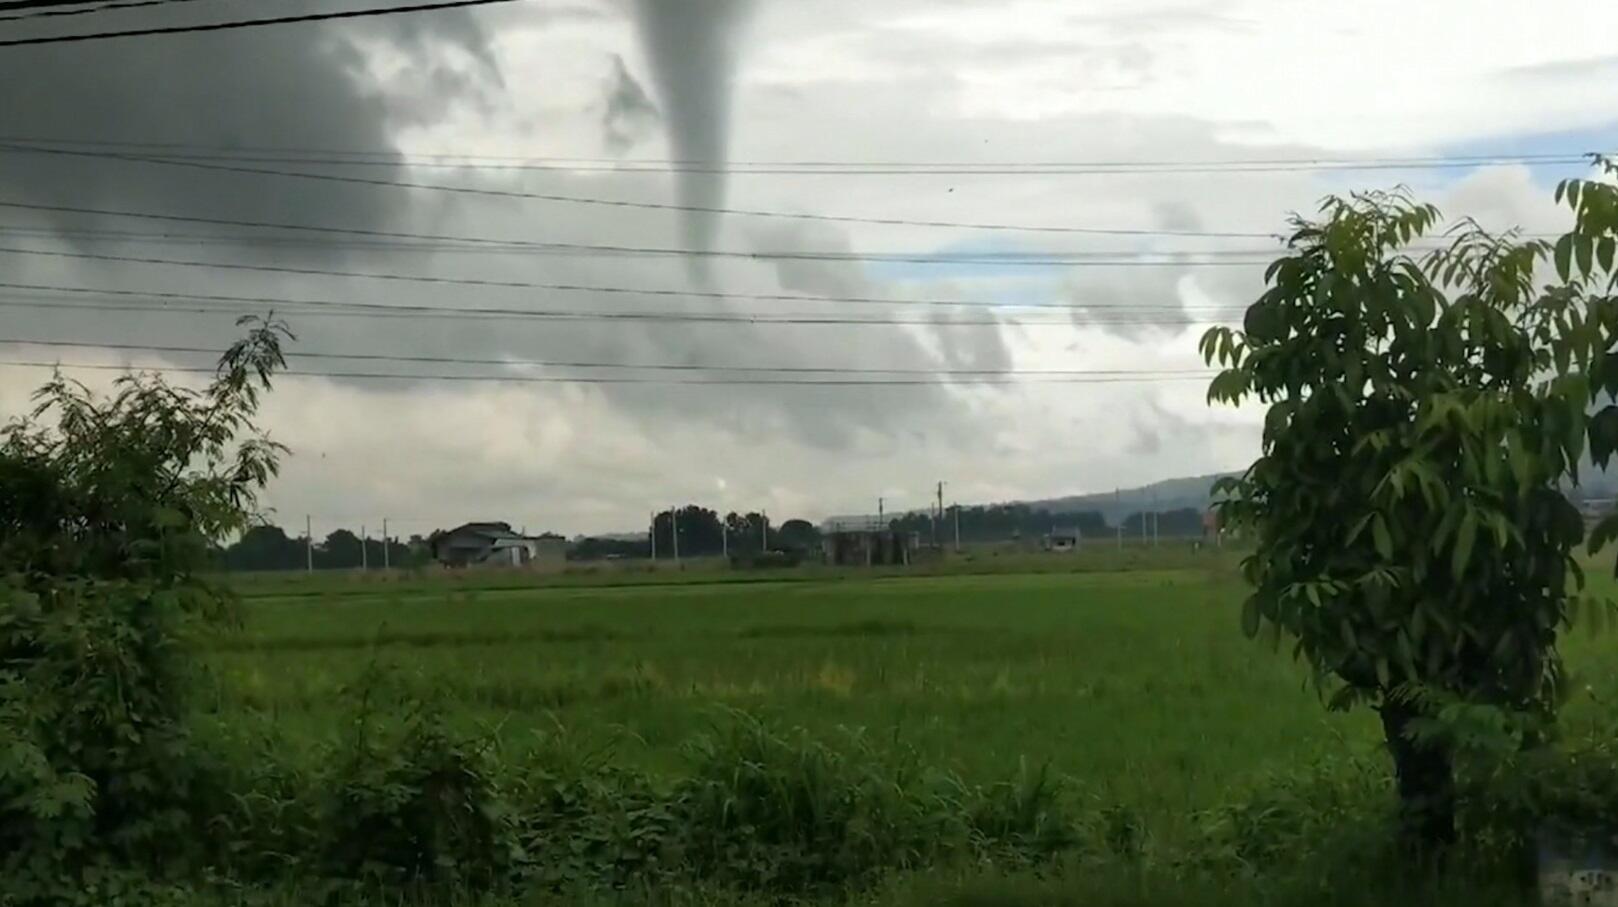 Bild zu Tornado